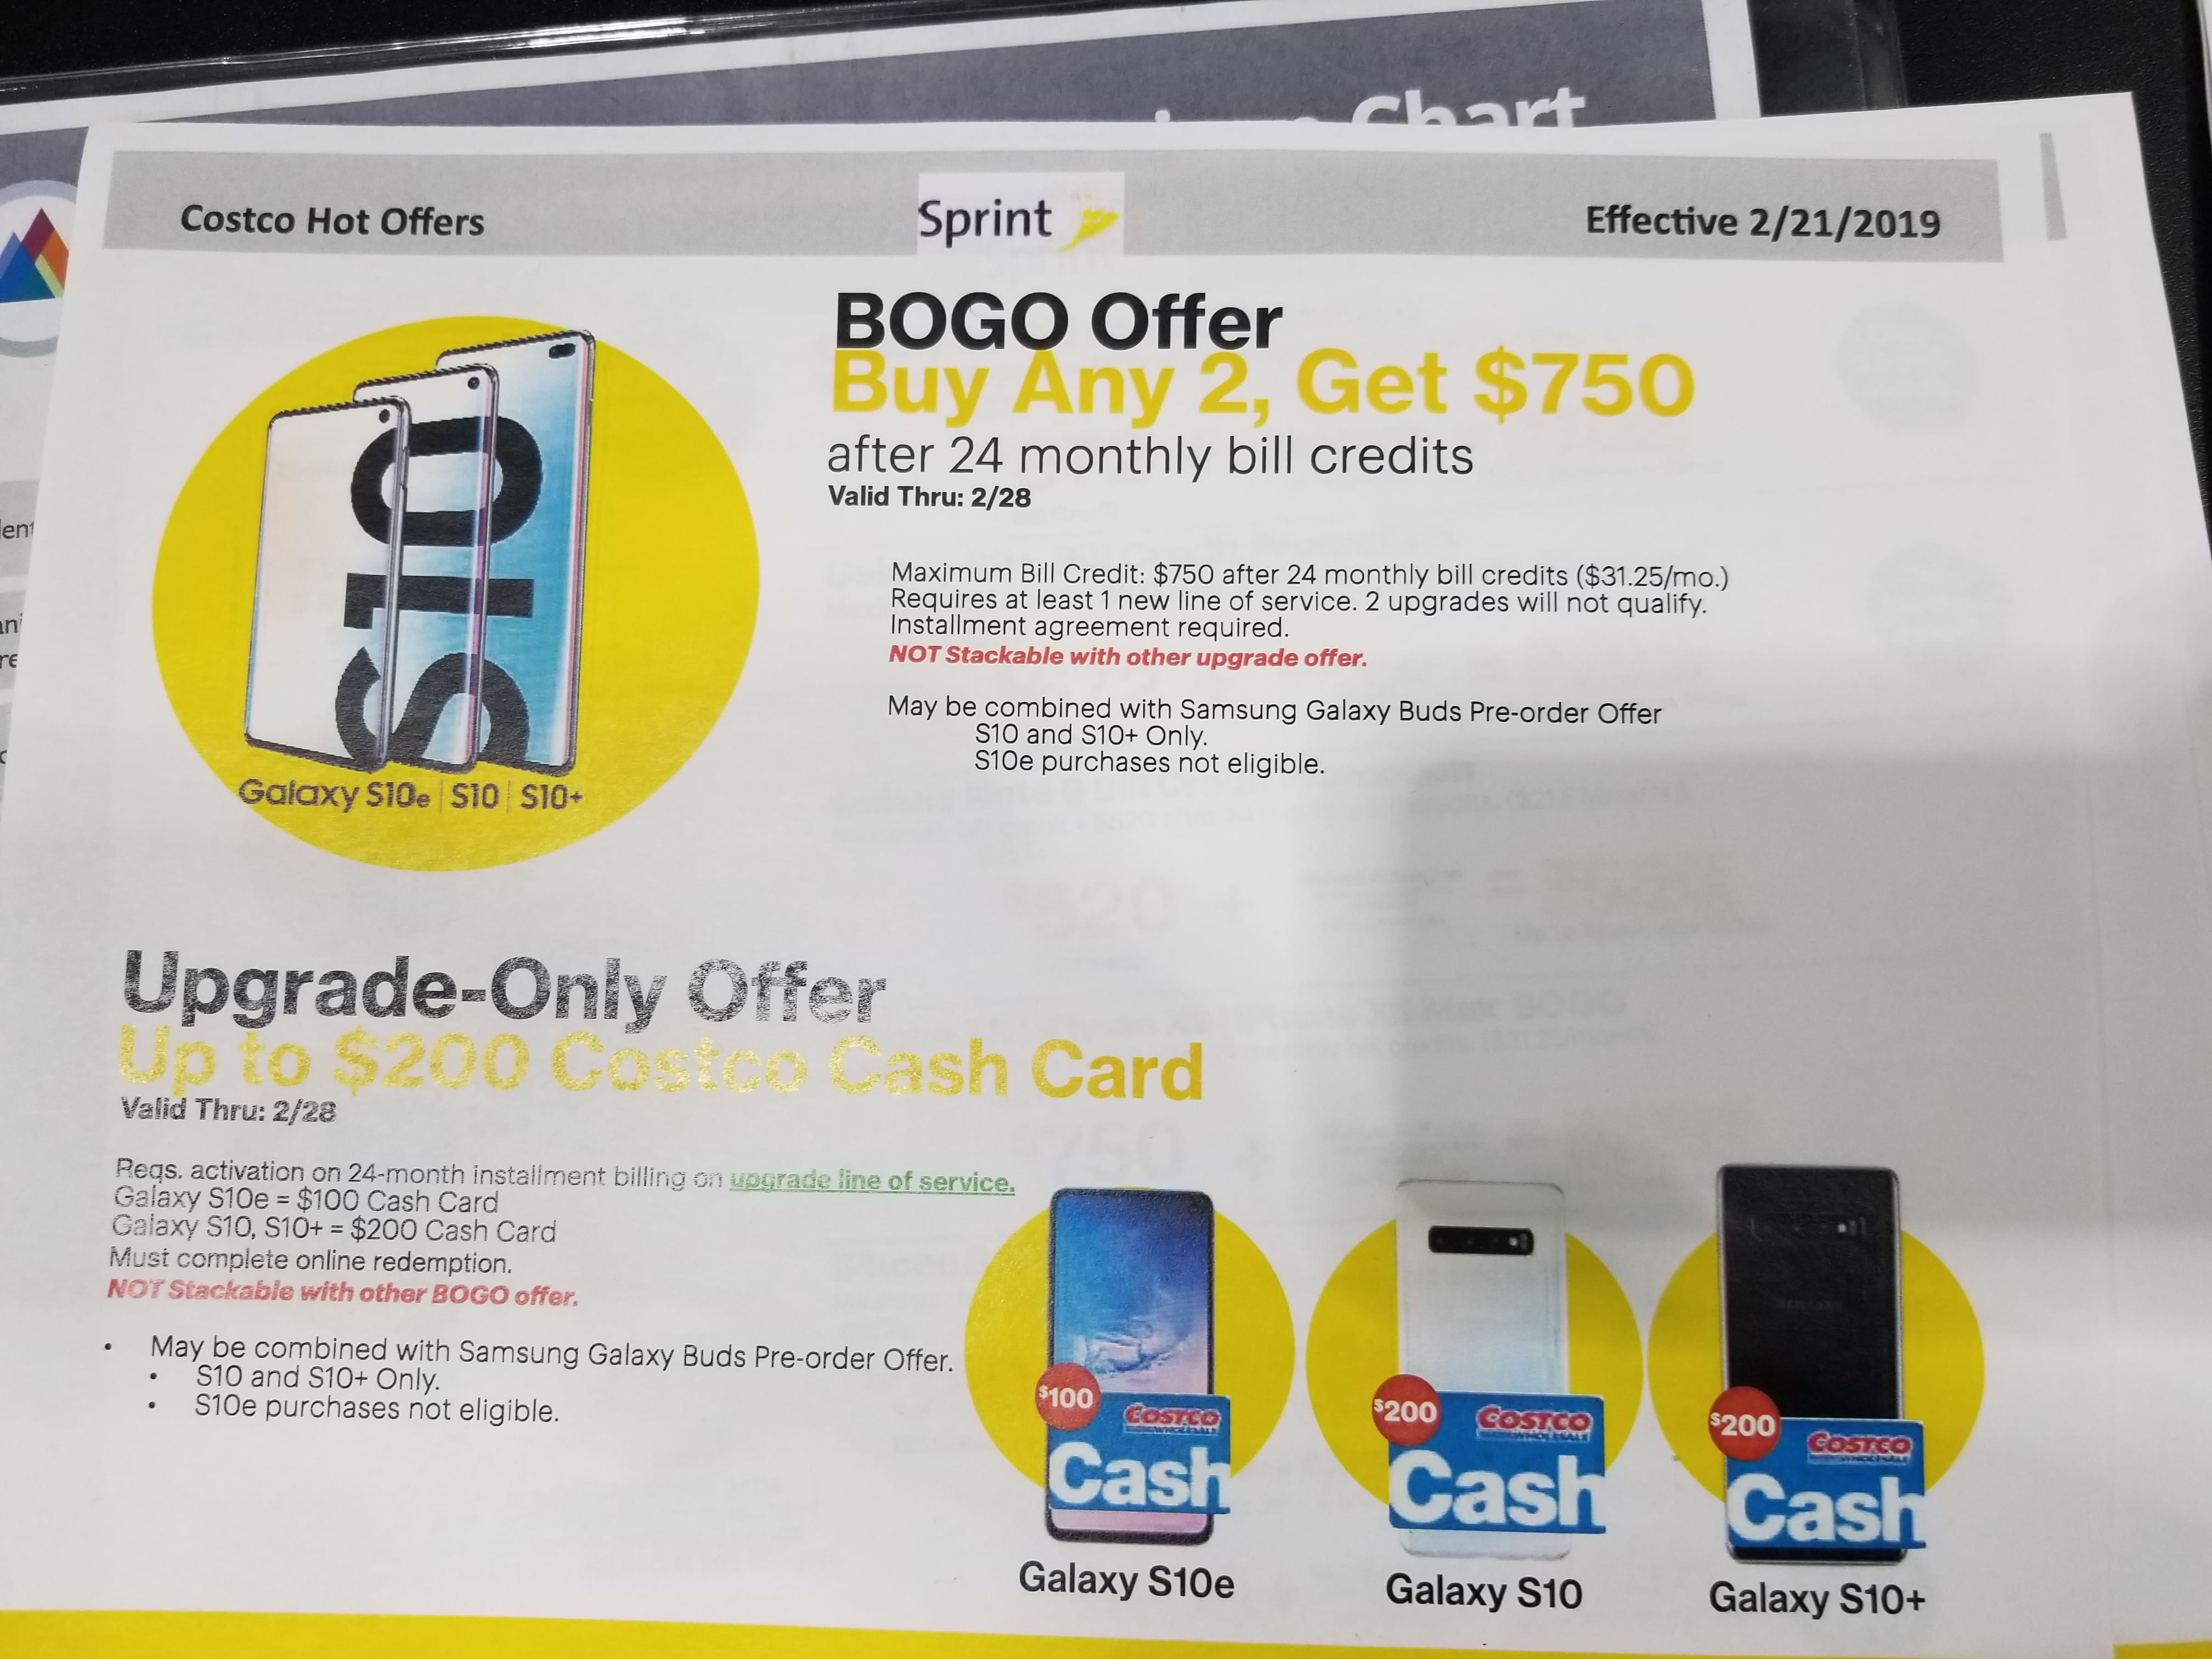 7b26c787051 Sprint Samsung Galaxy S10 & S10+, Costco $200 GC & free wireless .